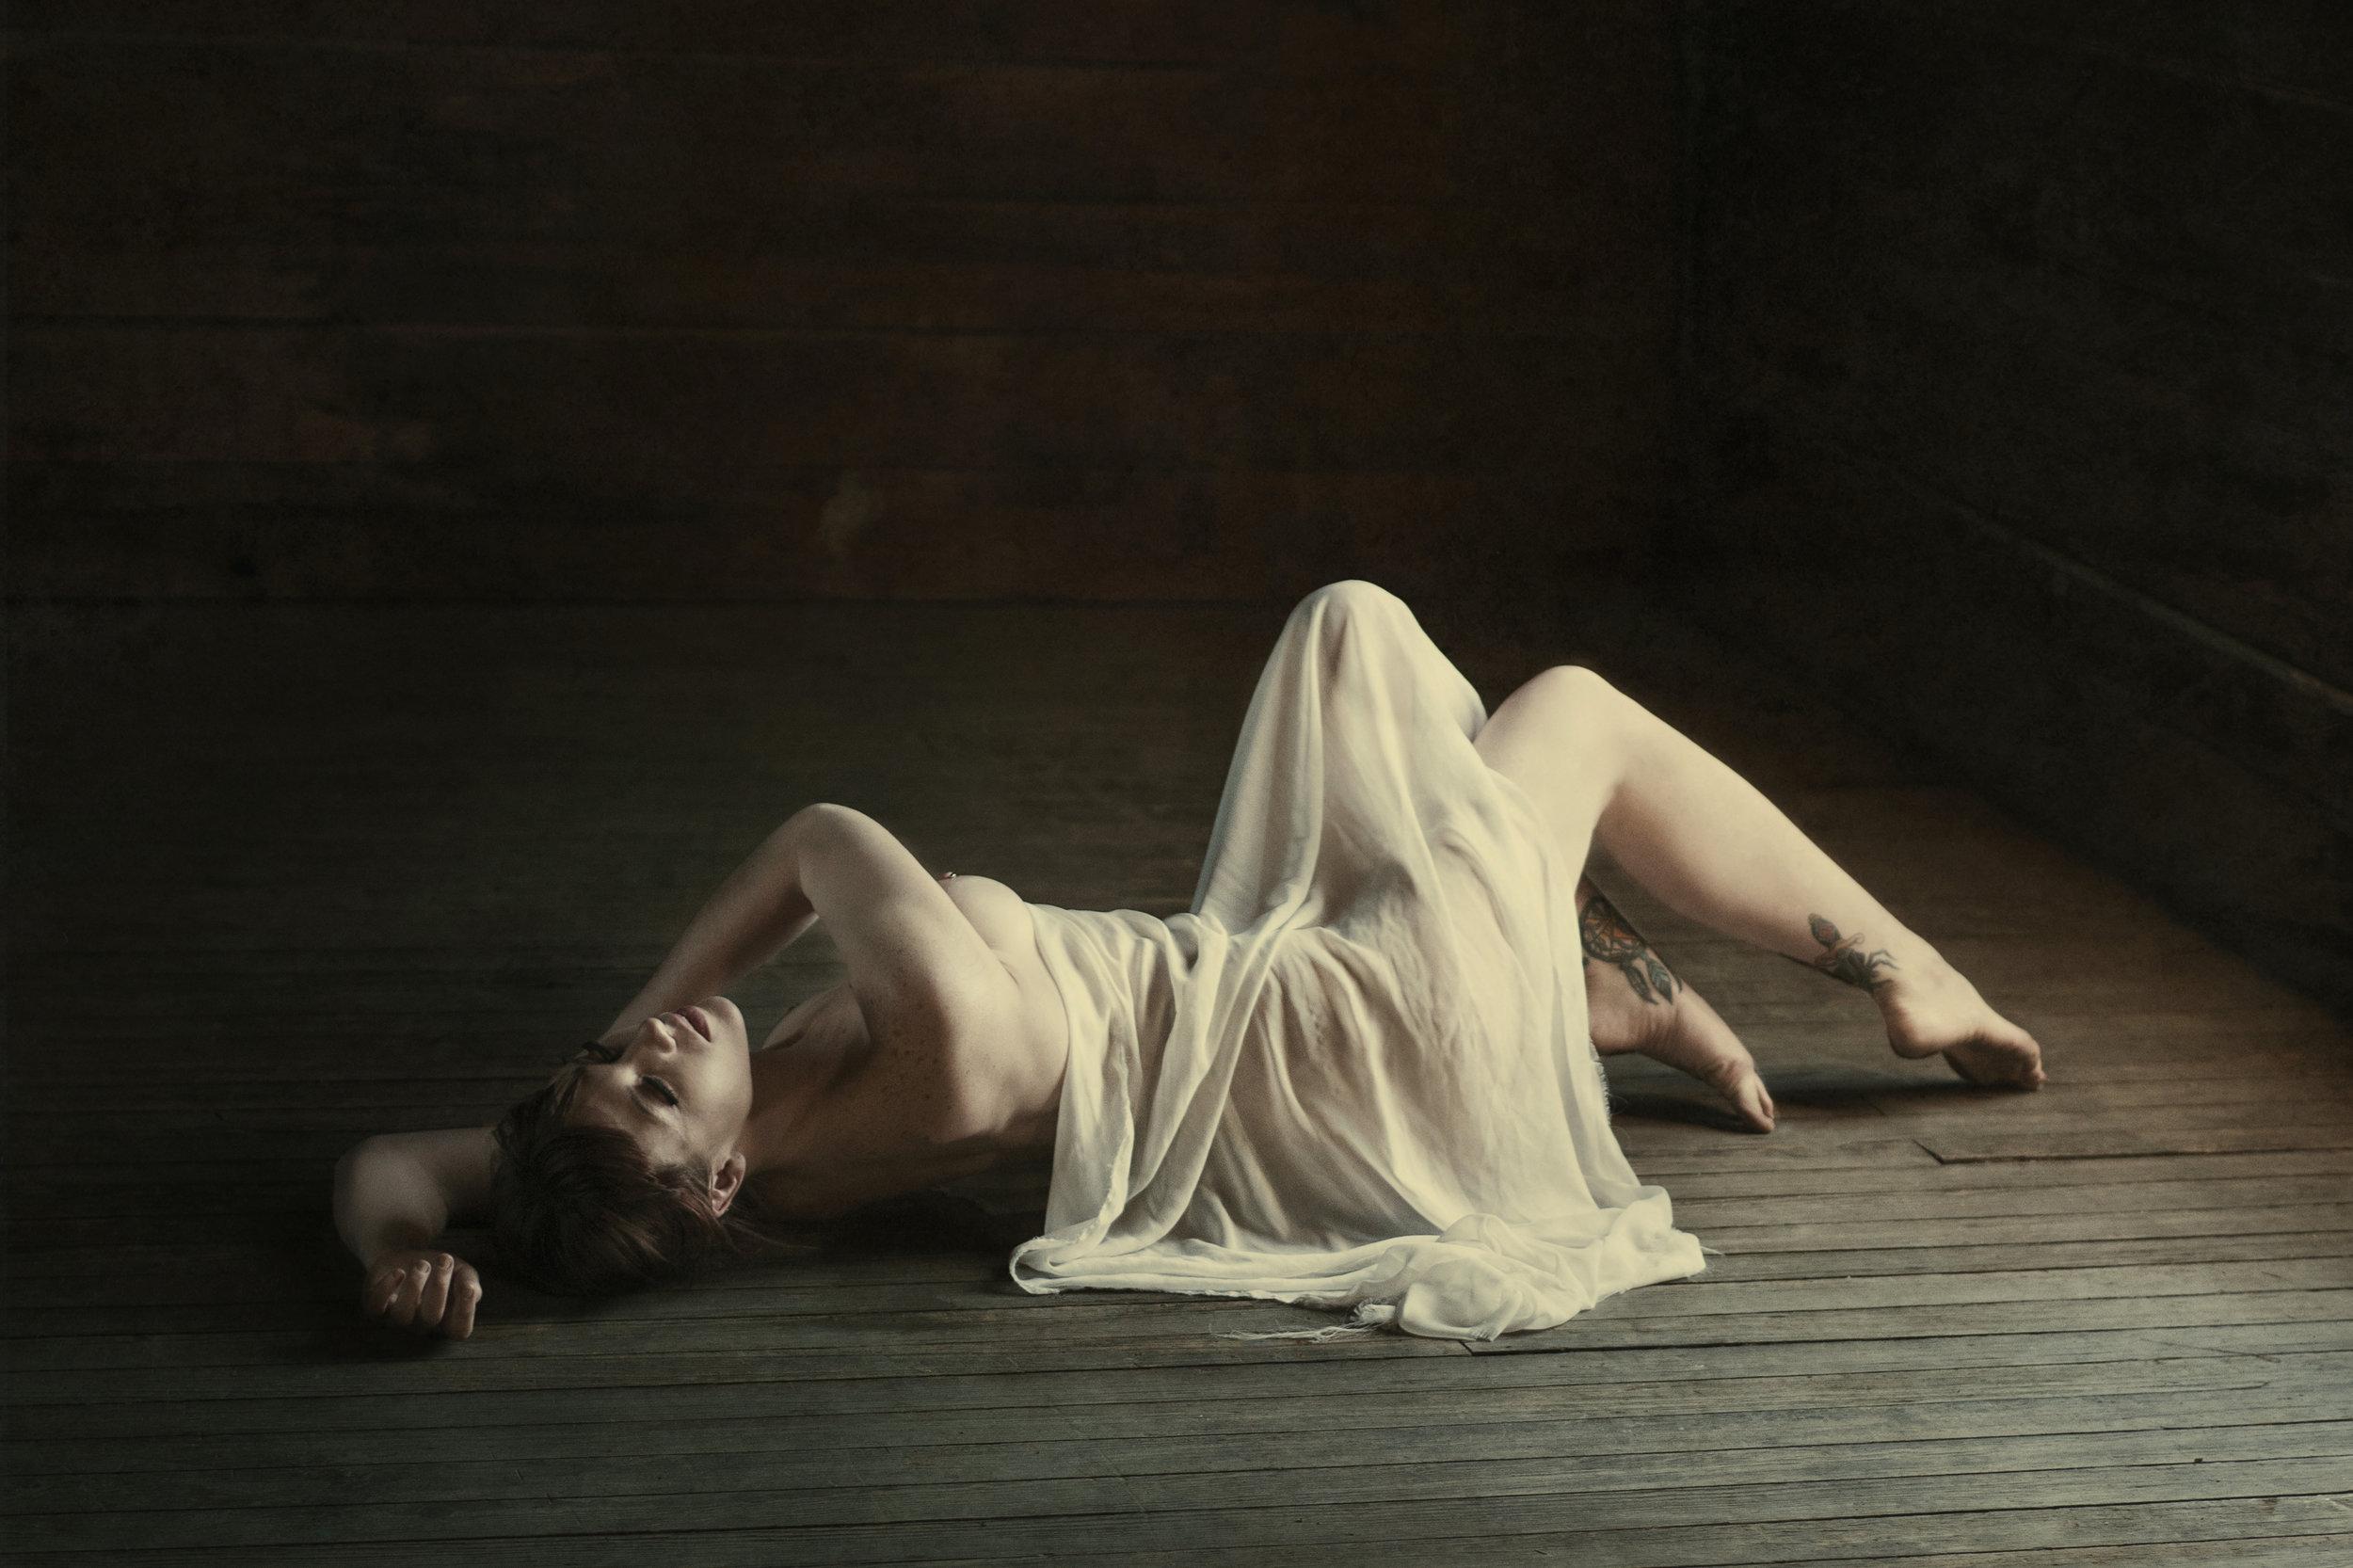 nude girl with chiffon.jpg